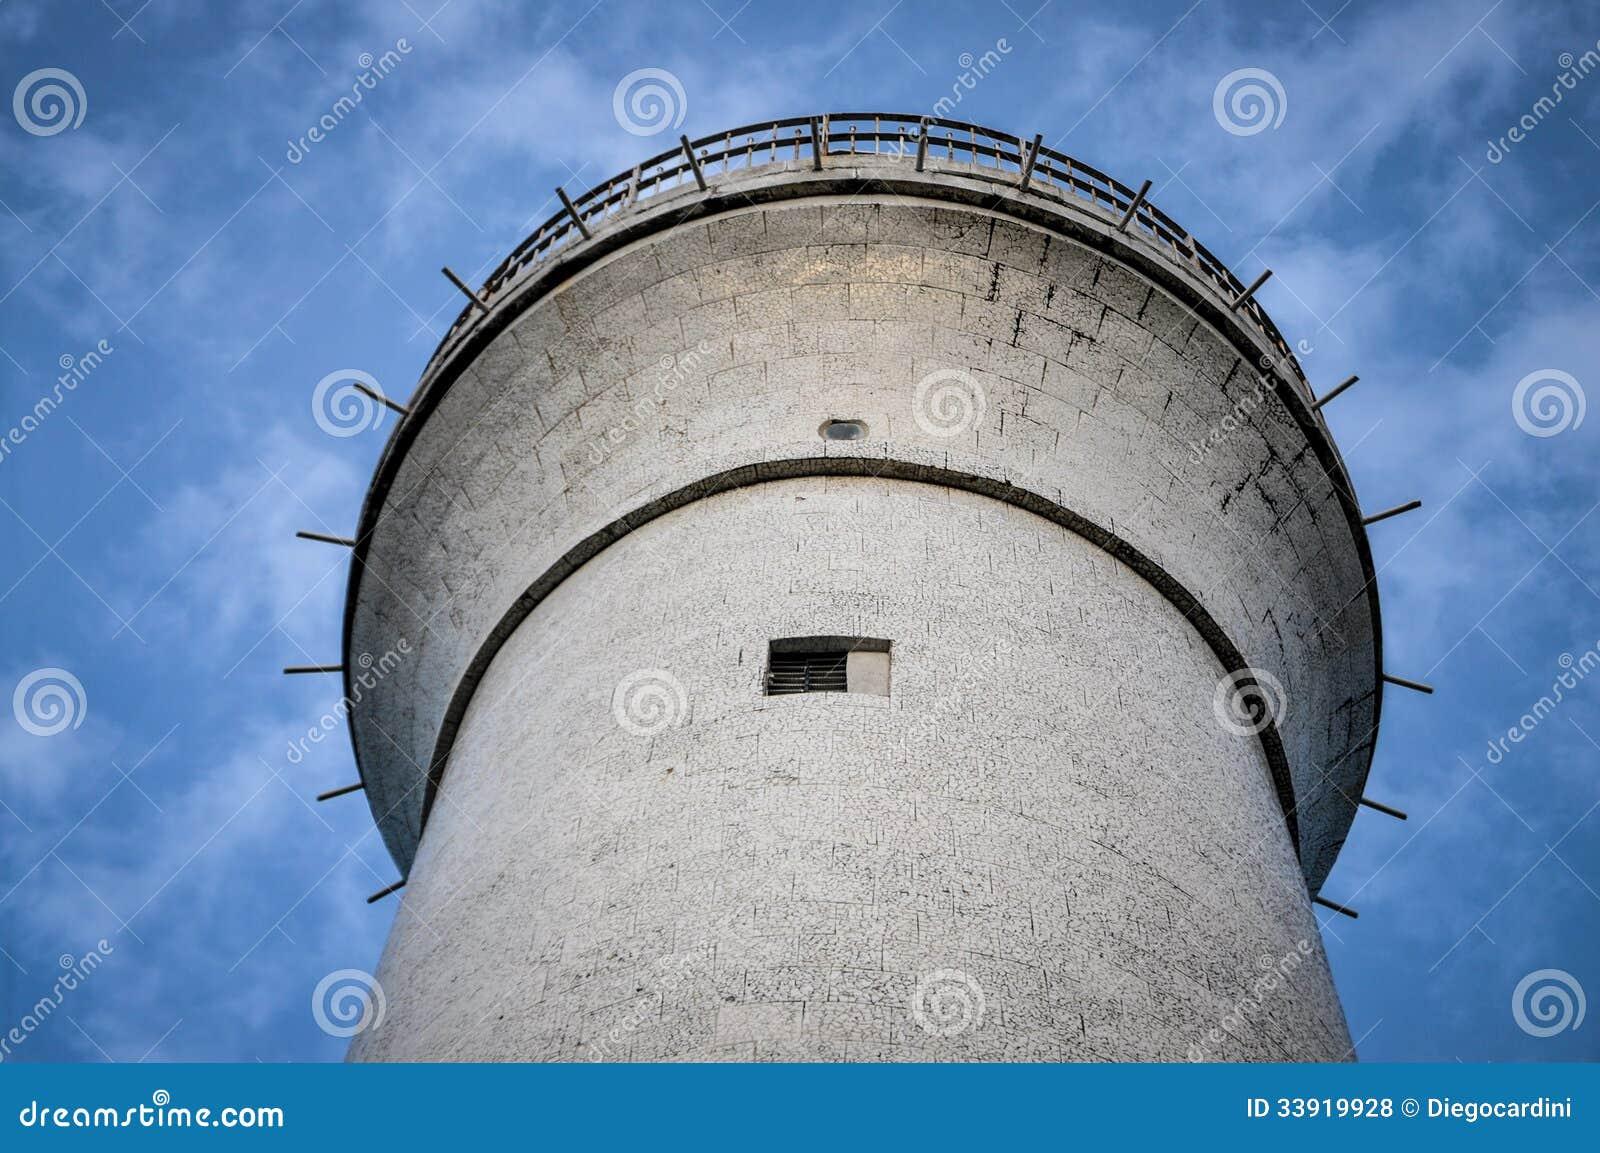 Lighthouse at Morro Do Sao Paulo Island, Bahia, Brazil. South America.